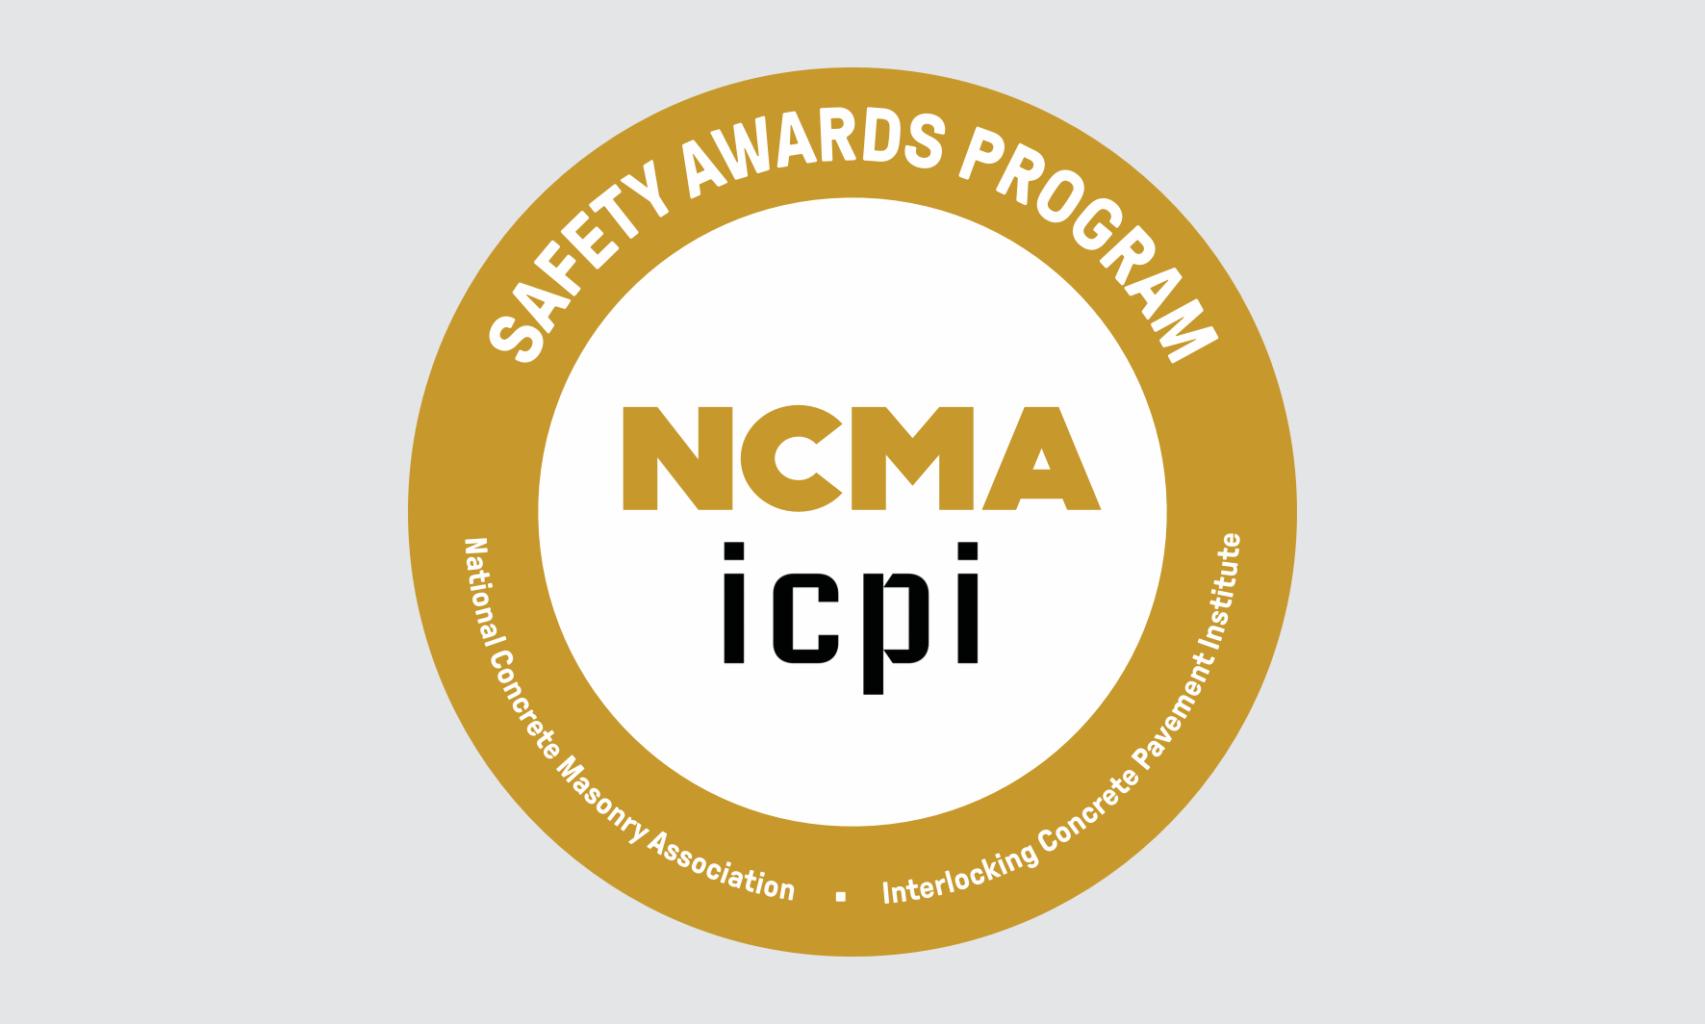 NCMA Safety Awards Program